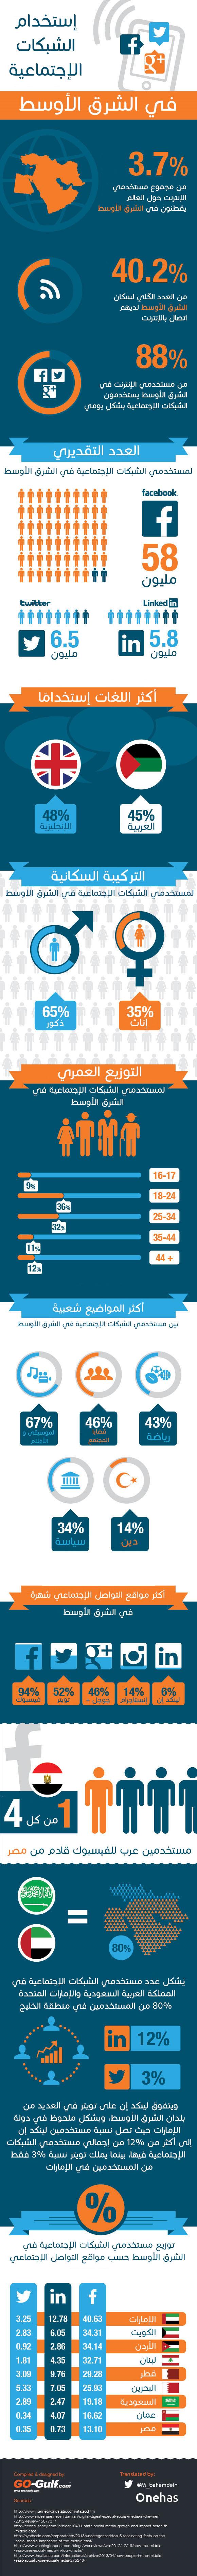 social-media-middle-east-arabic